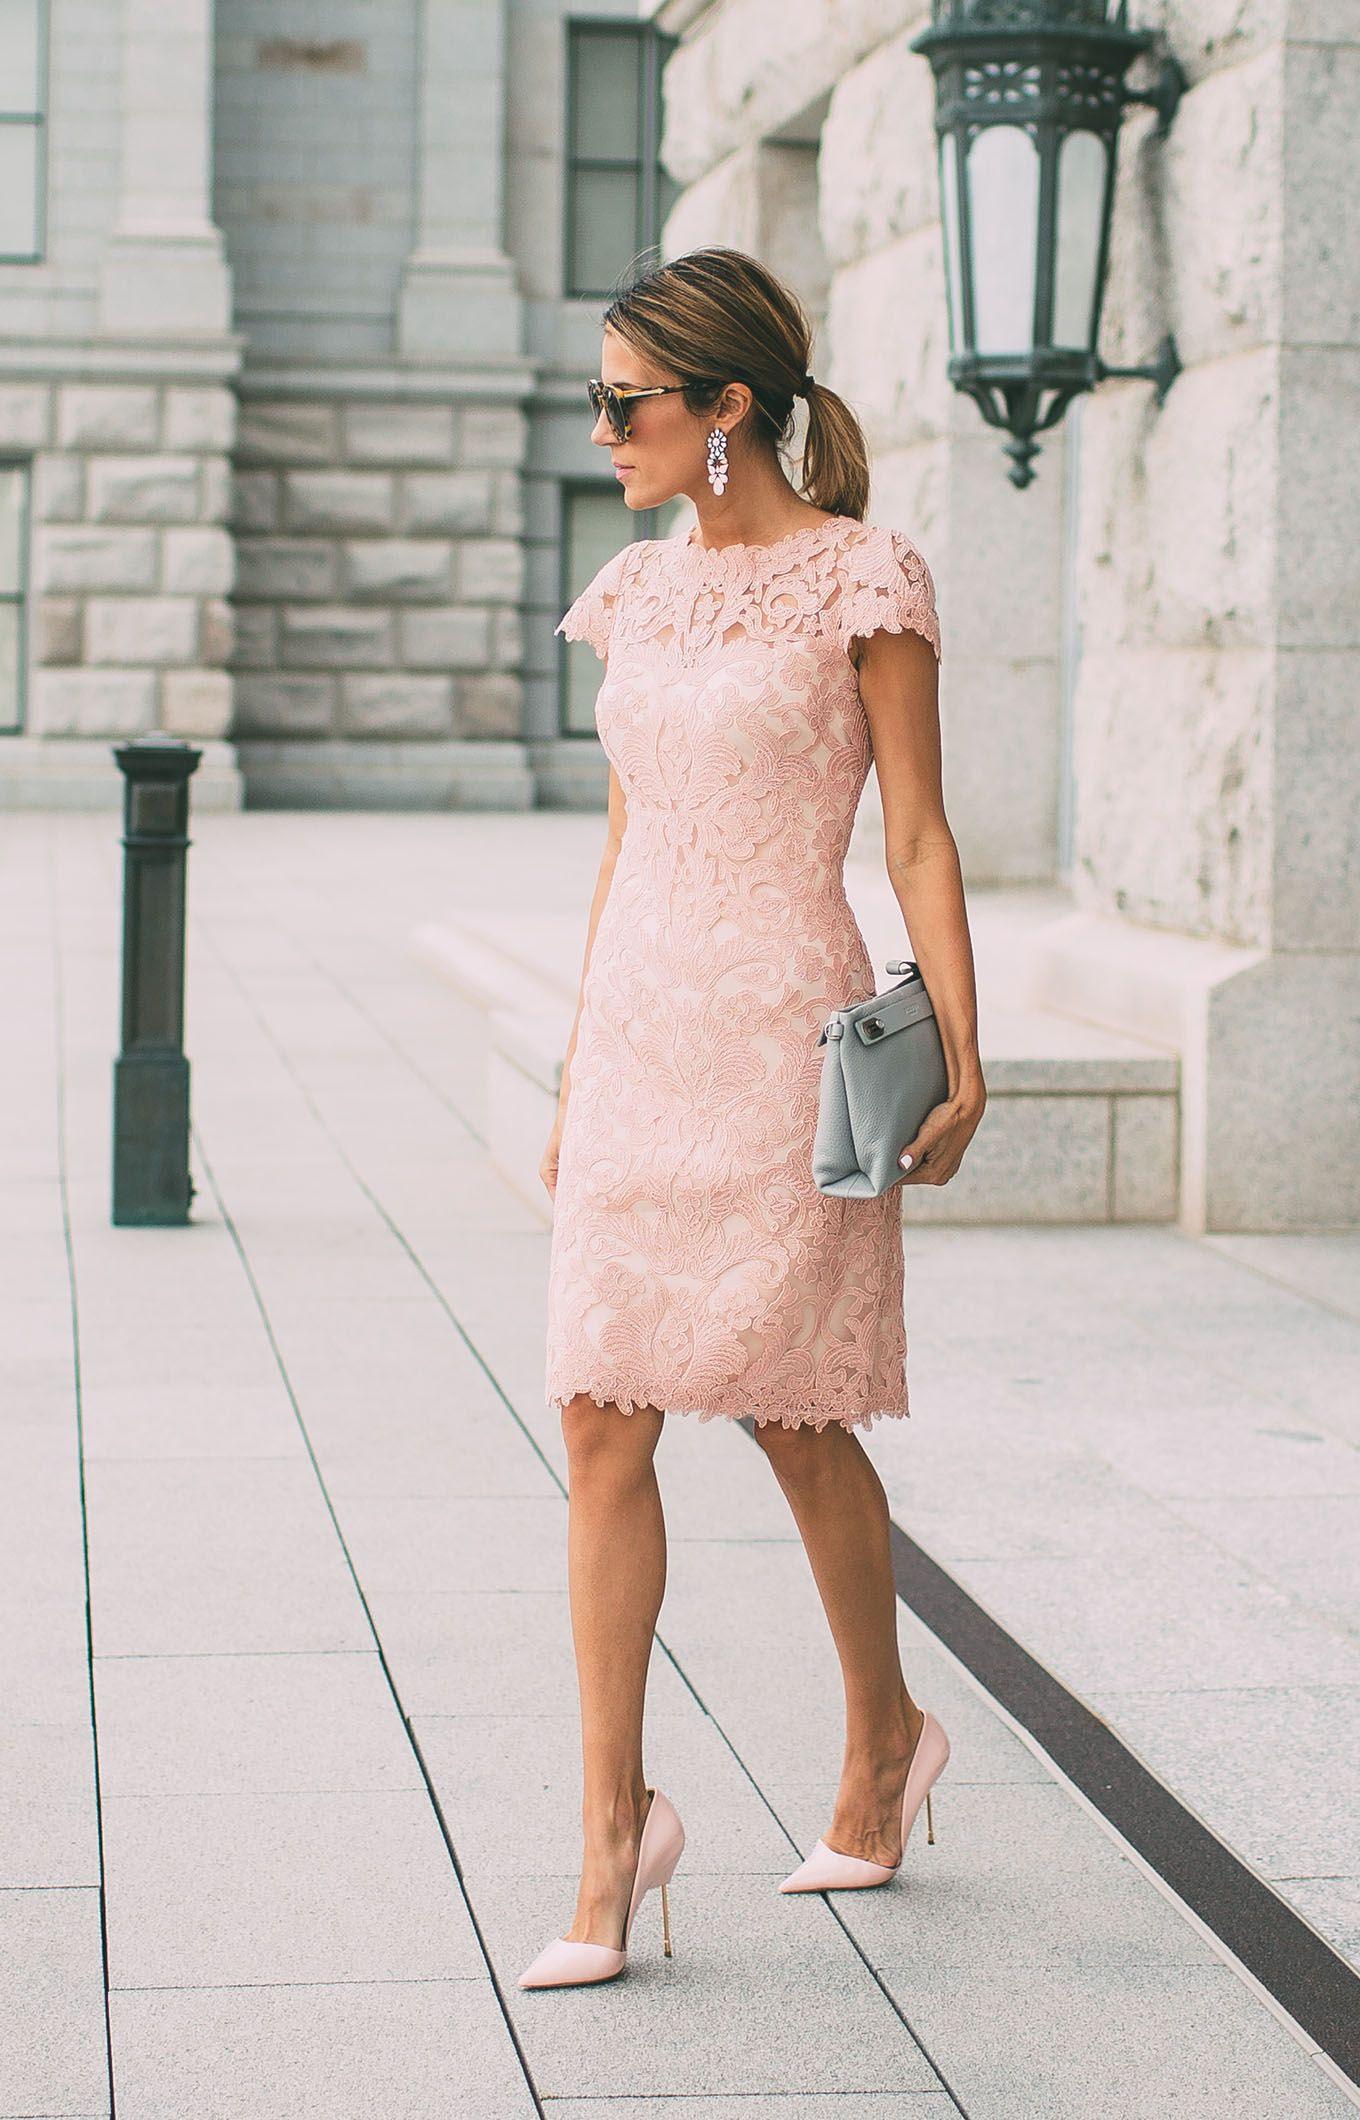 17 Cool Rosa Kleid Kurz Bester PreisFormal Einfach Rosa Kleid Kurz Galerie